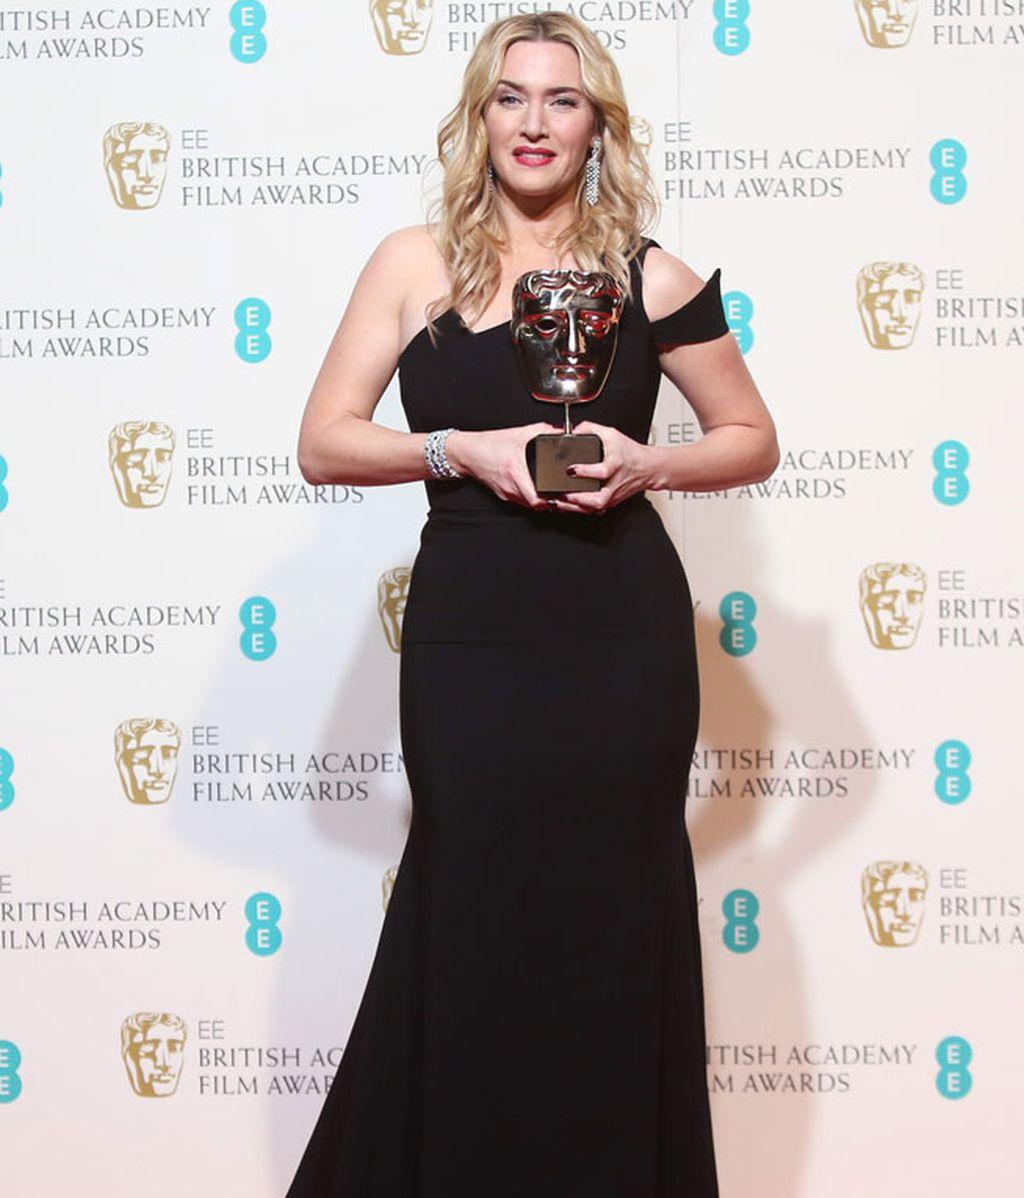 Kate Winslet, DiCaprio o Cate Blachett... La 'red carpet' de los BAFTA, foto a foto